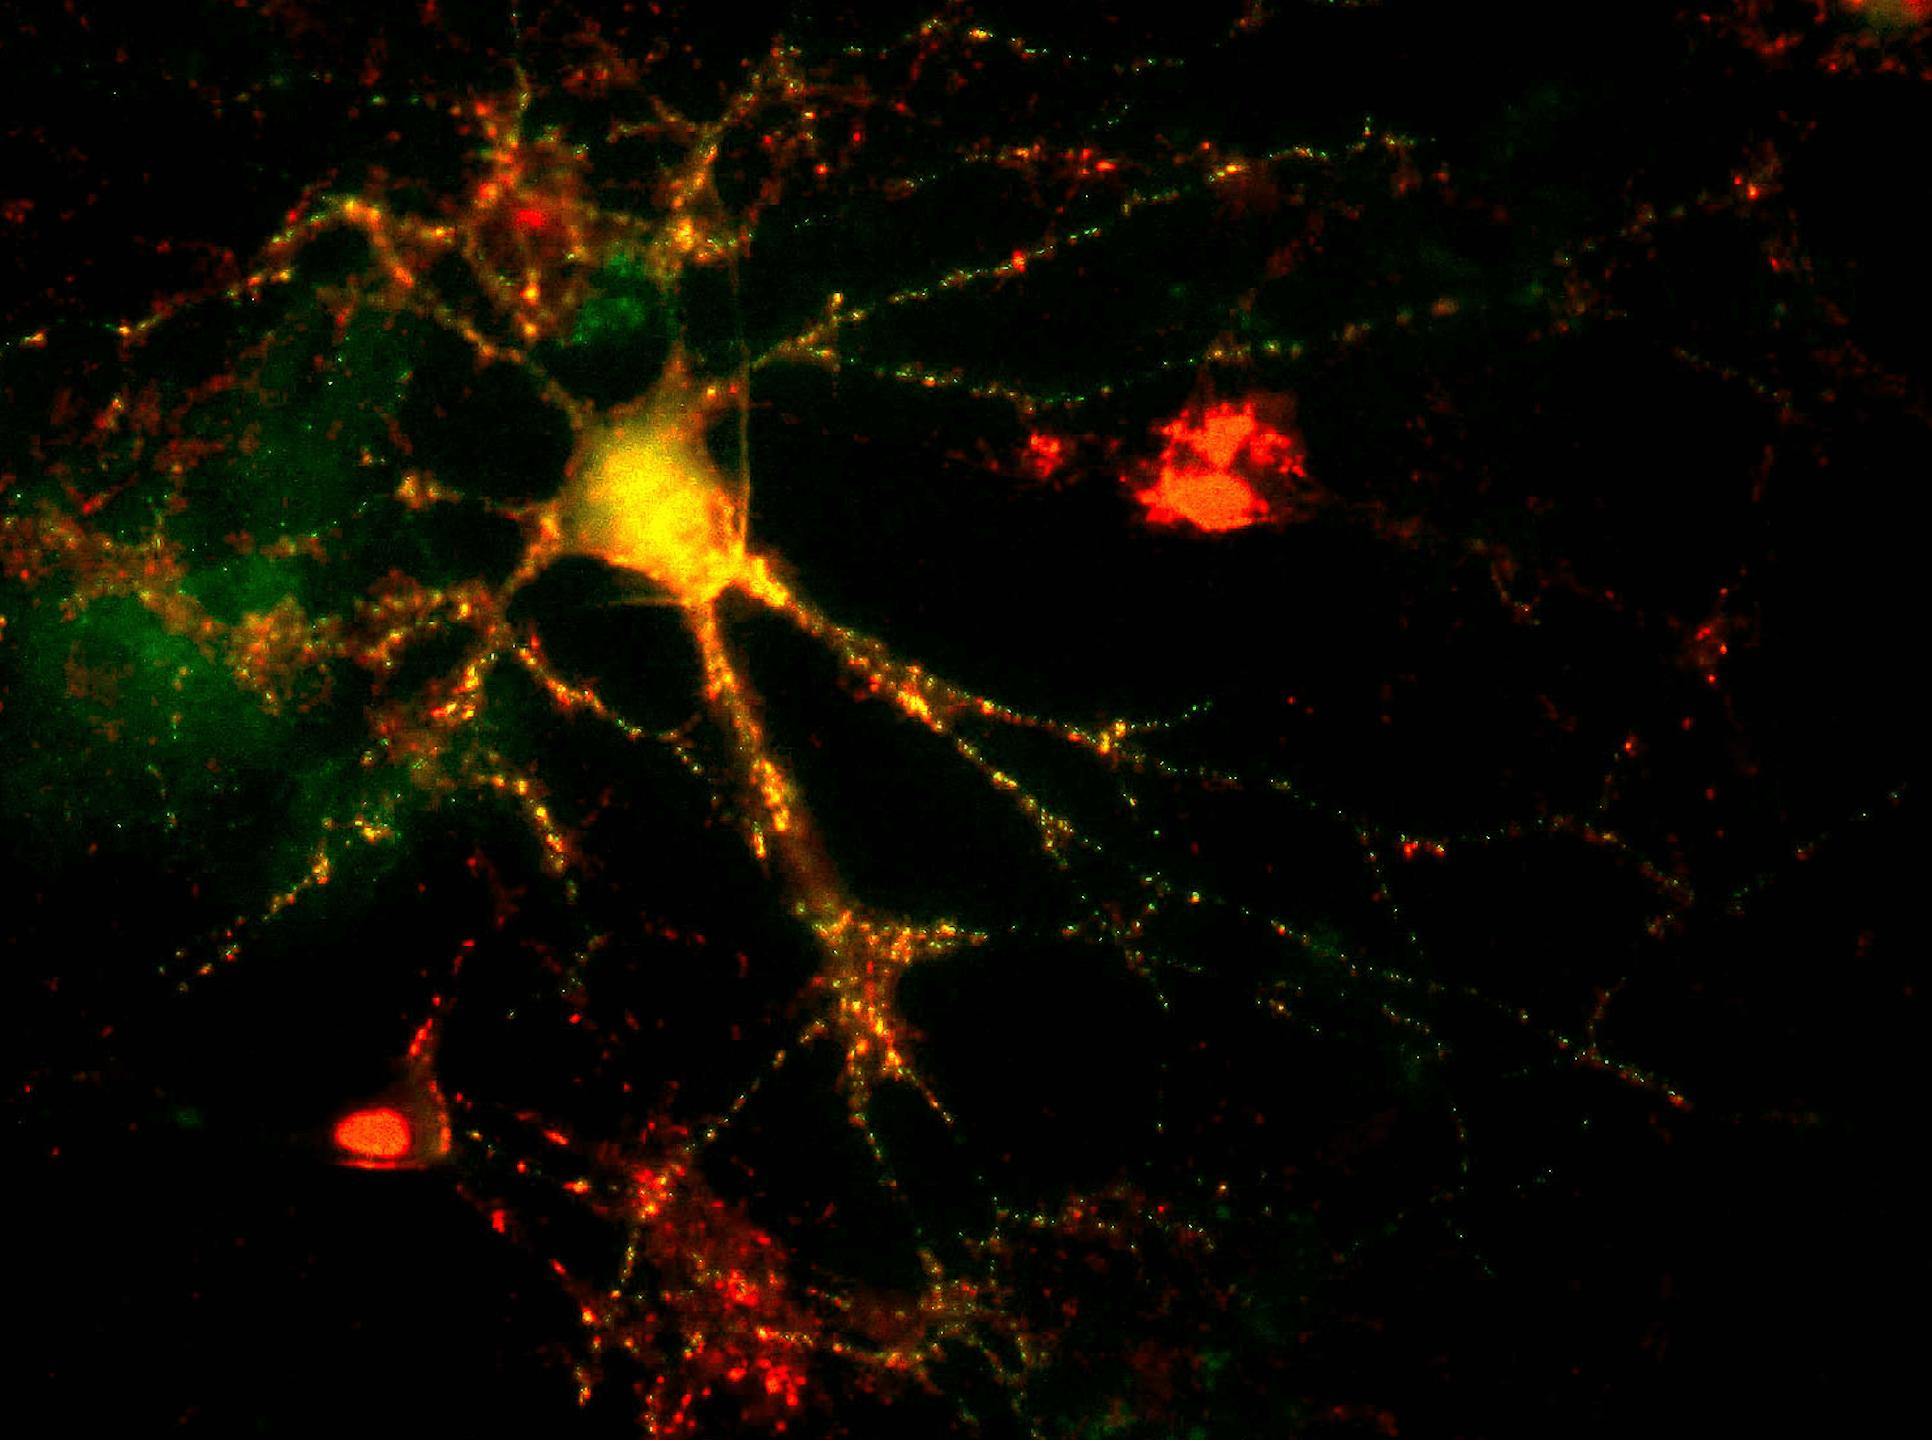 synaptic imaging